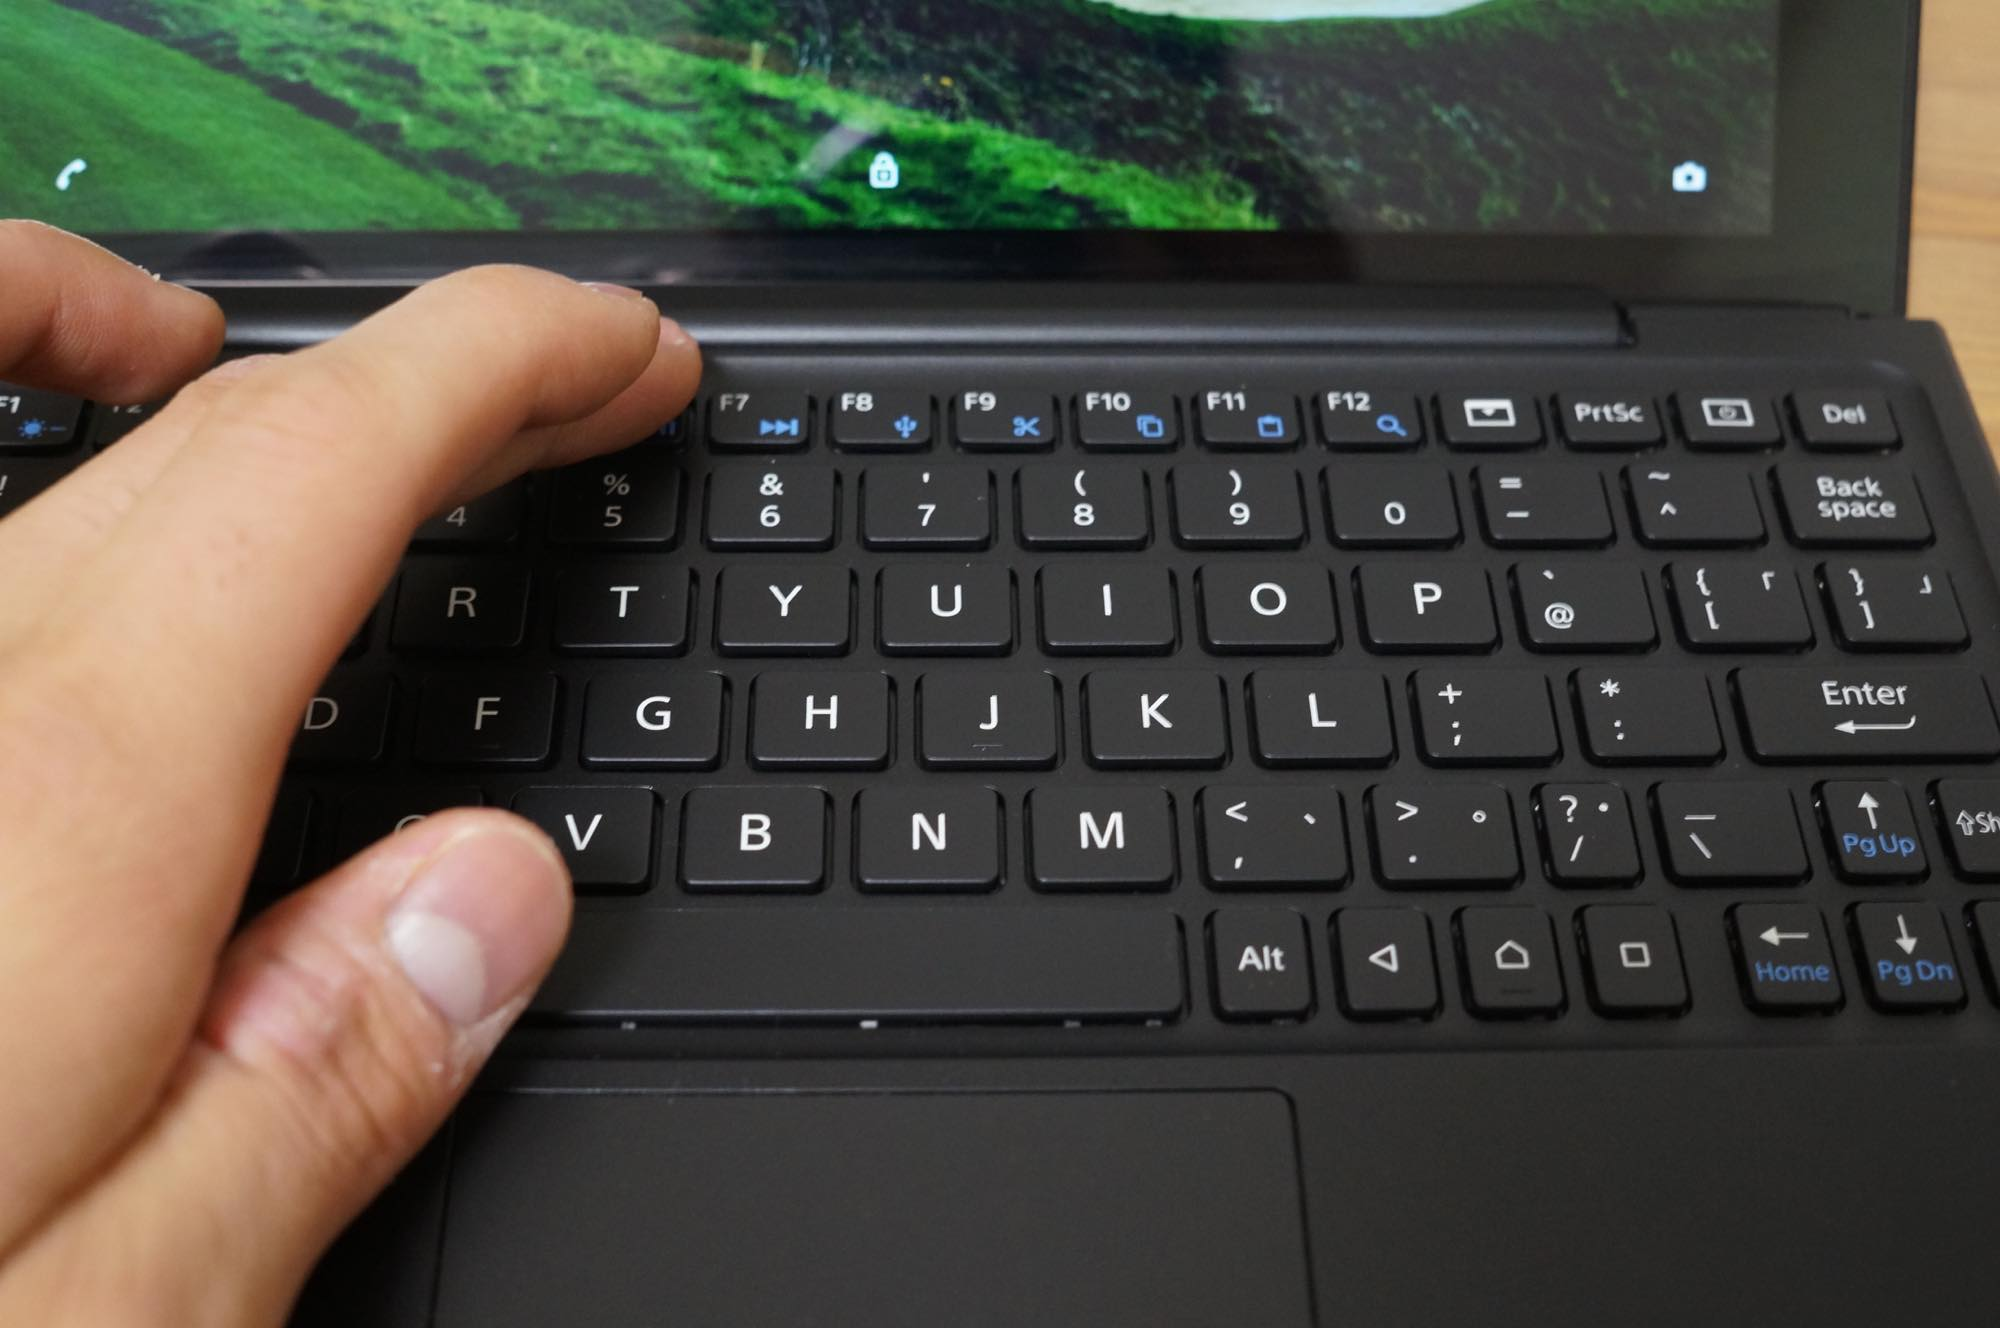 Xperia-Z4-tablet-keyboard5